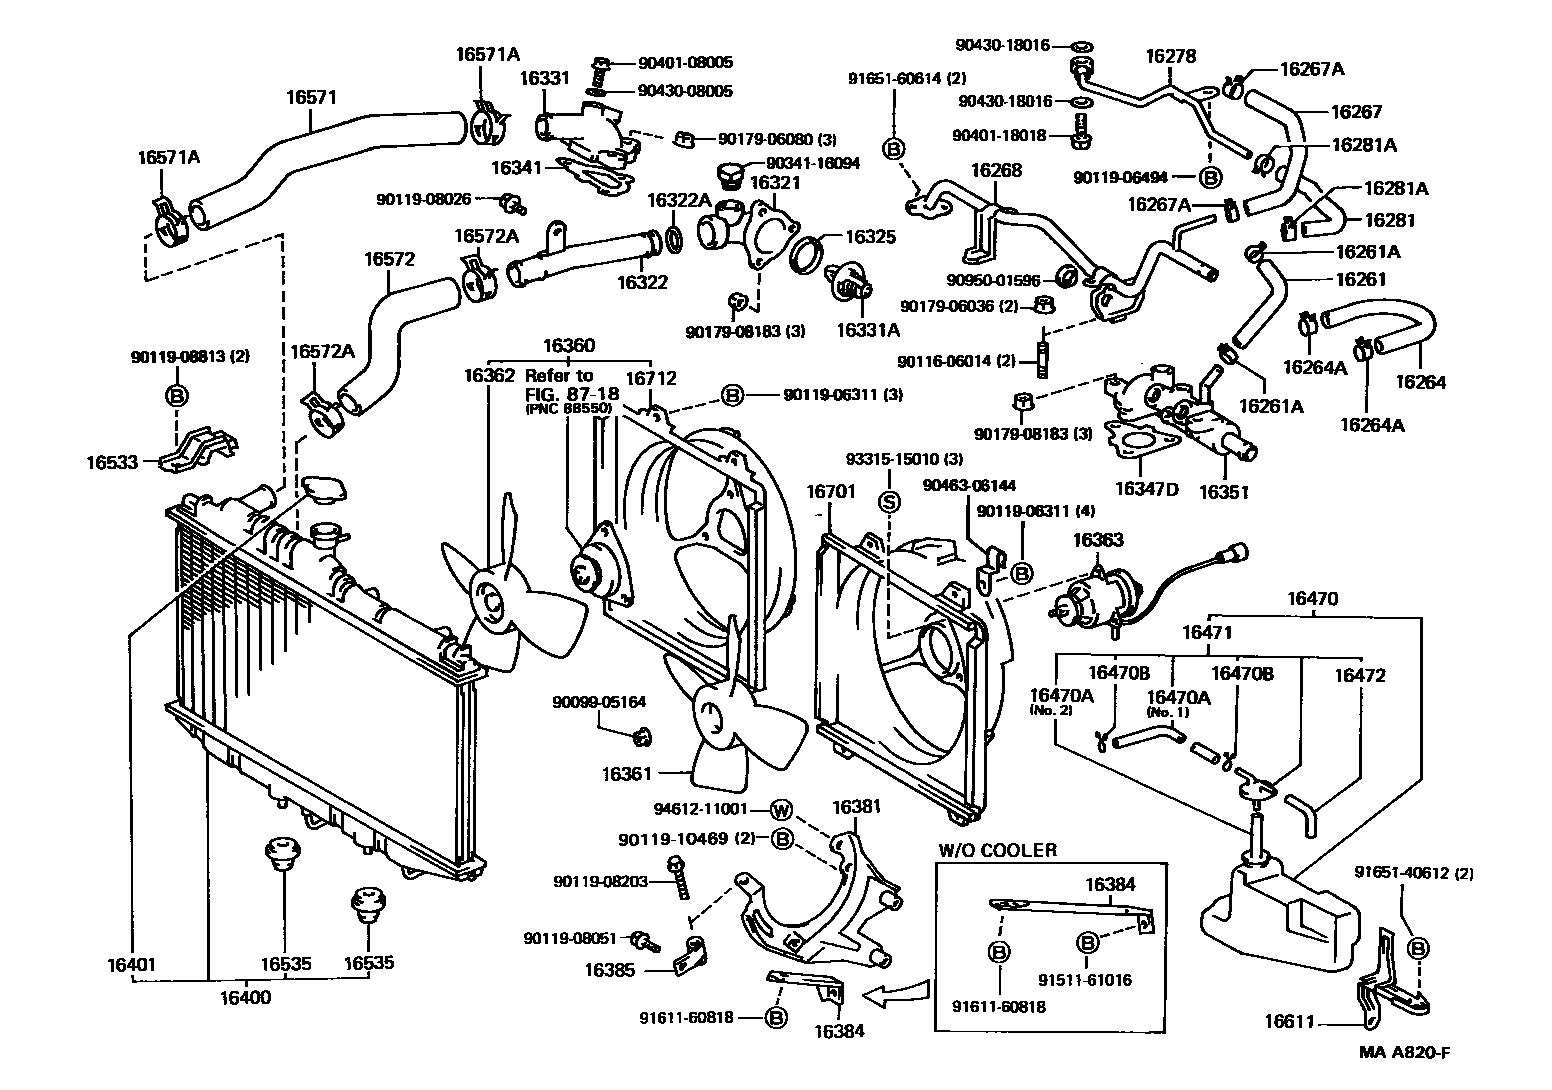 92 Camry Engine Diagram - Trane Model Dcy036f1hoac Wiring Diagram for  Wiring Diagram SchematicsWiring Diagram Schematics